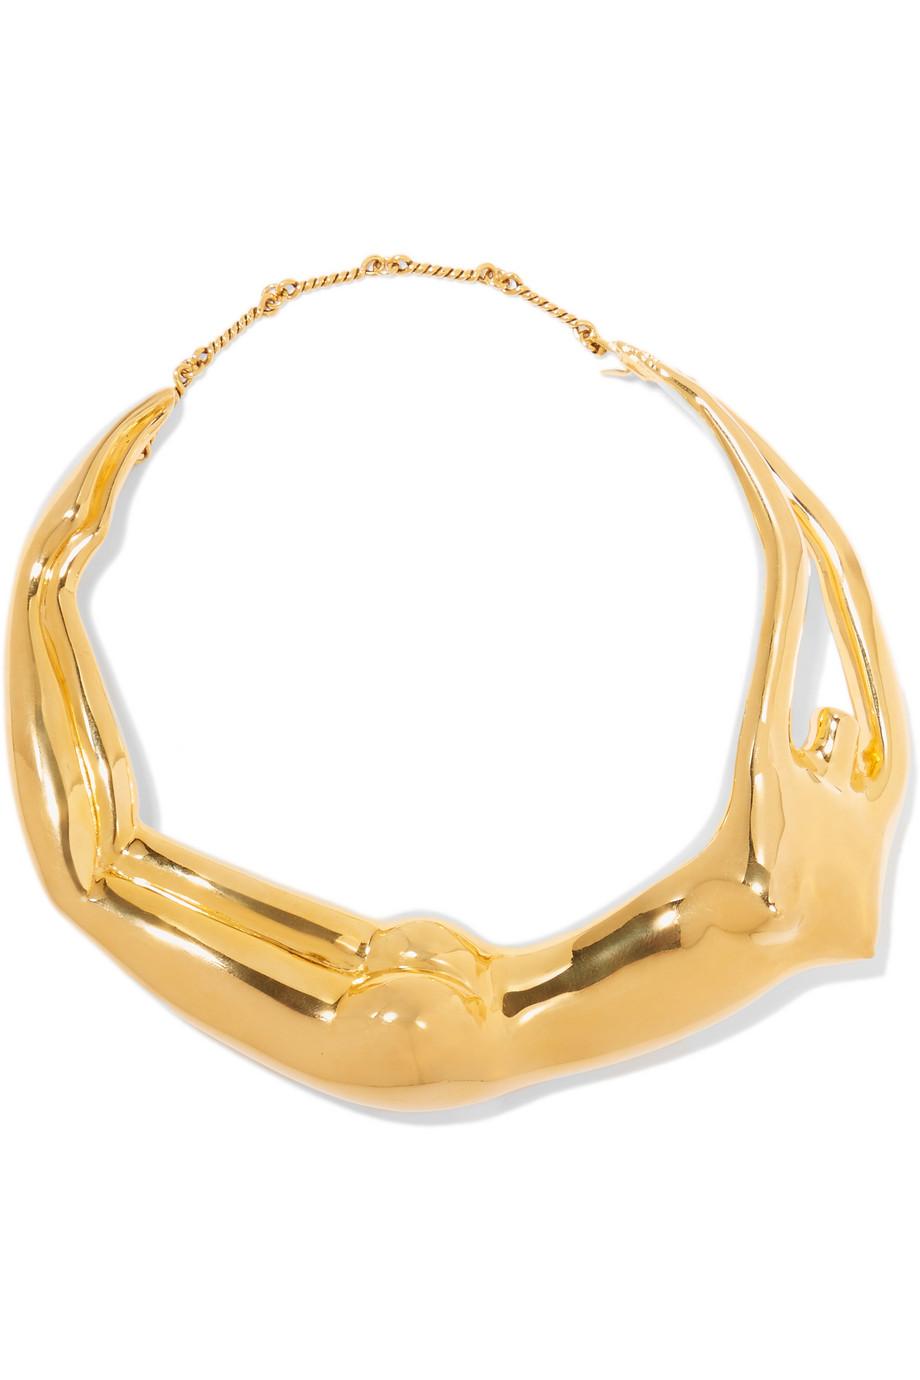 Body Gold-Plated Necklace, Aurélie Bidermann, Women's